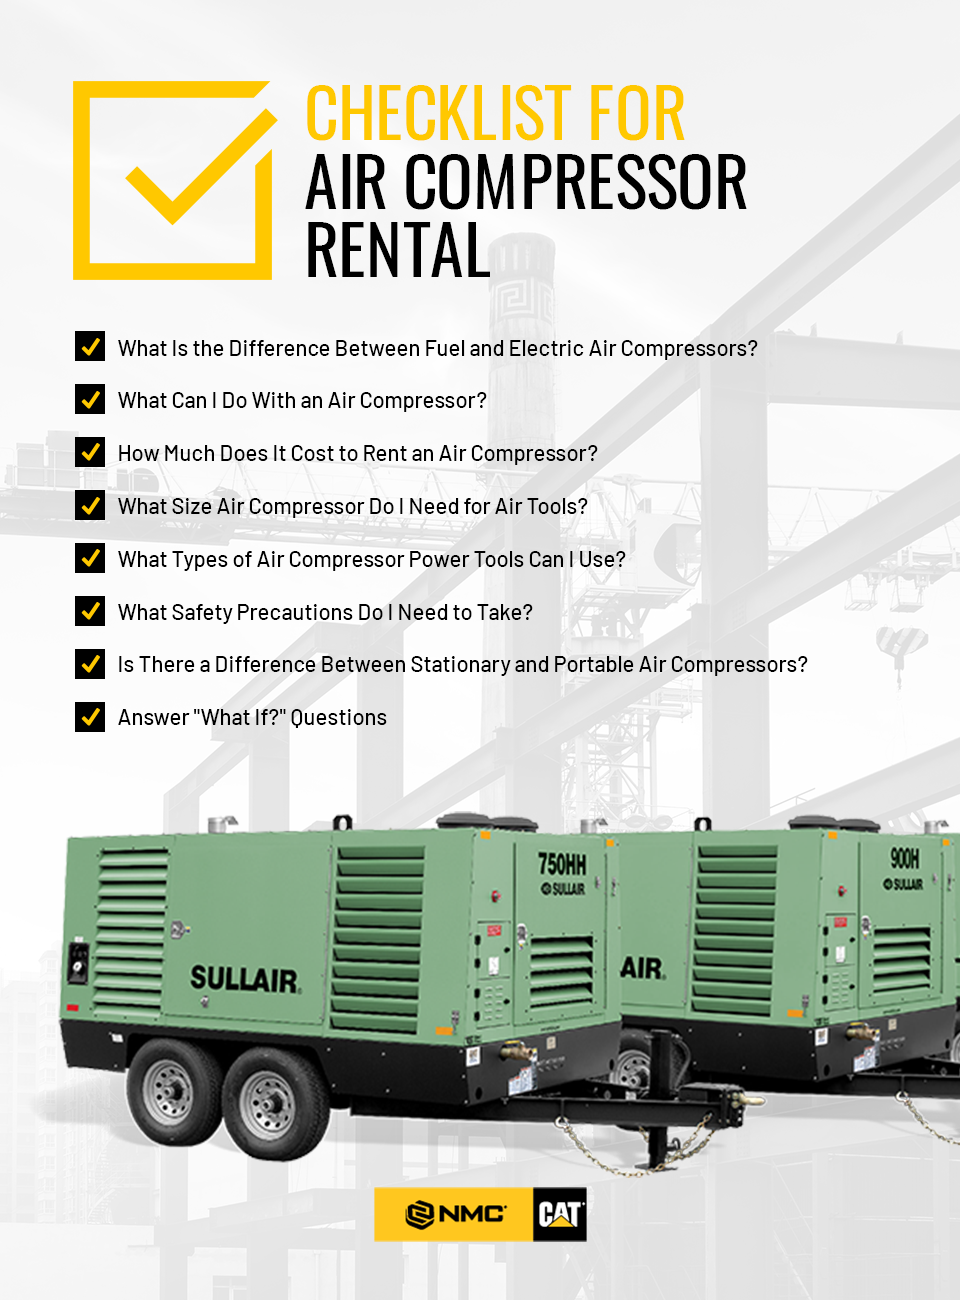 Checklist for Air Compressor Rental